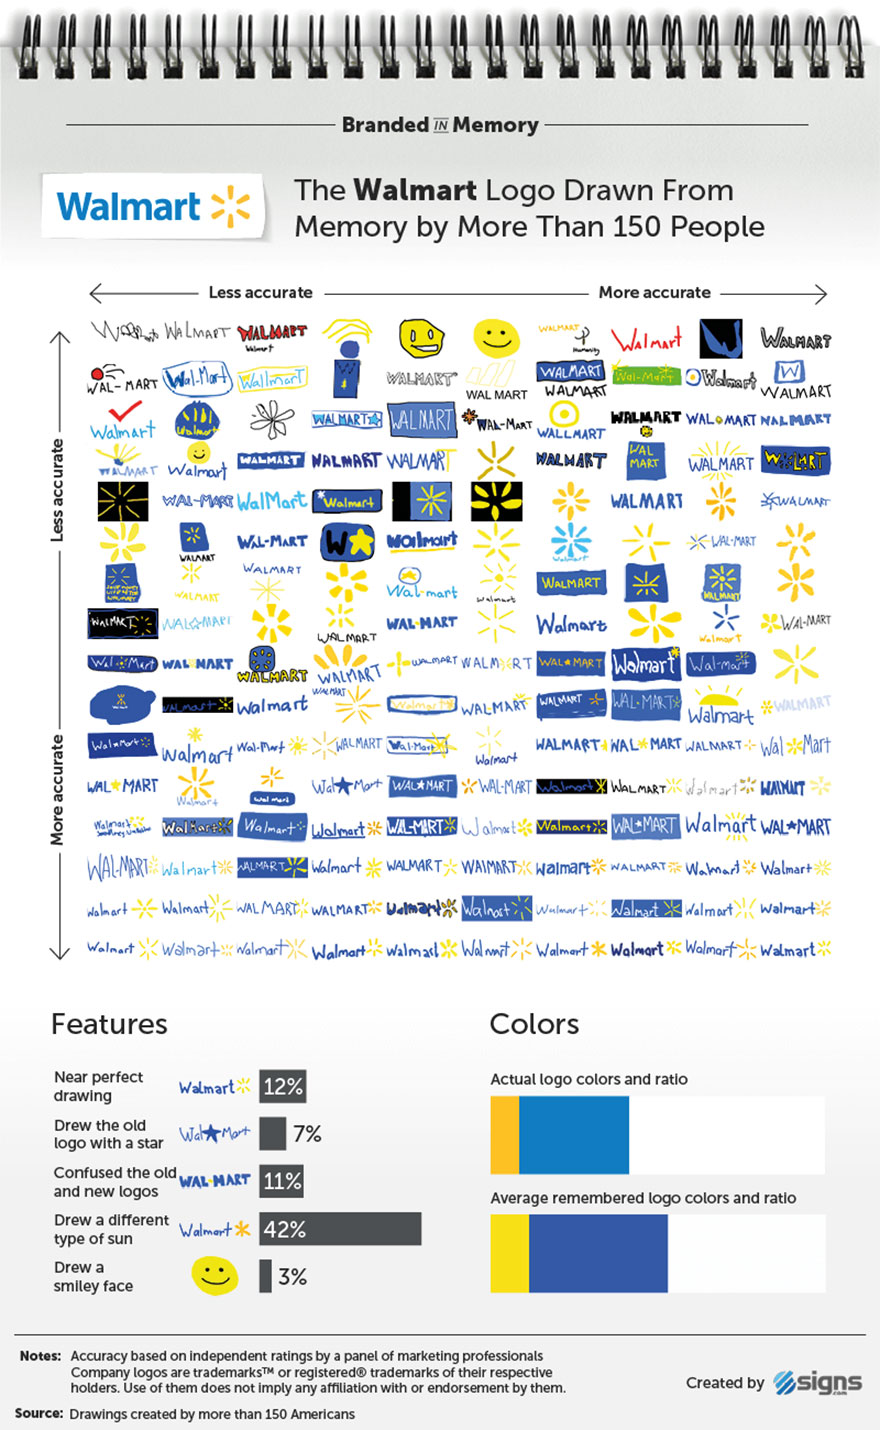 famous-brand-logos-drawn-from-memory-27-59d24678dc47b__880.jpg